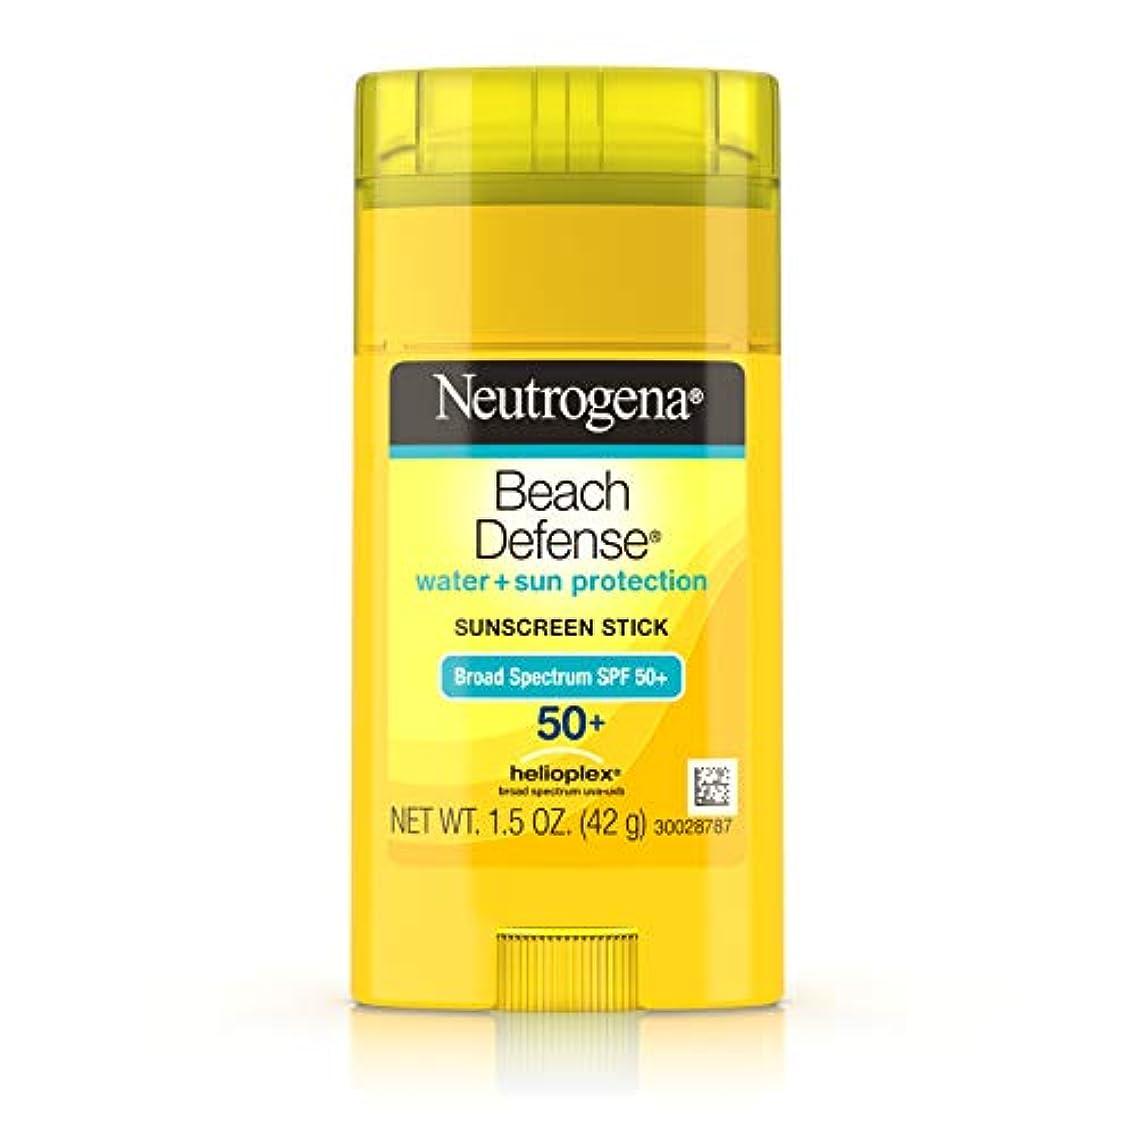 意図新鮮な発音Neutrogena Sunscreen Beach Defense Sunblock Stick SPF 50, 1.5 Ounce